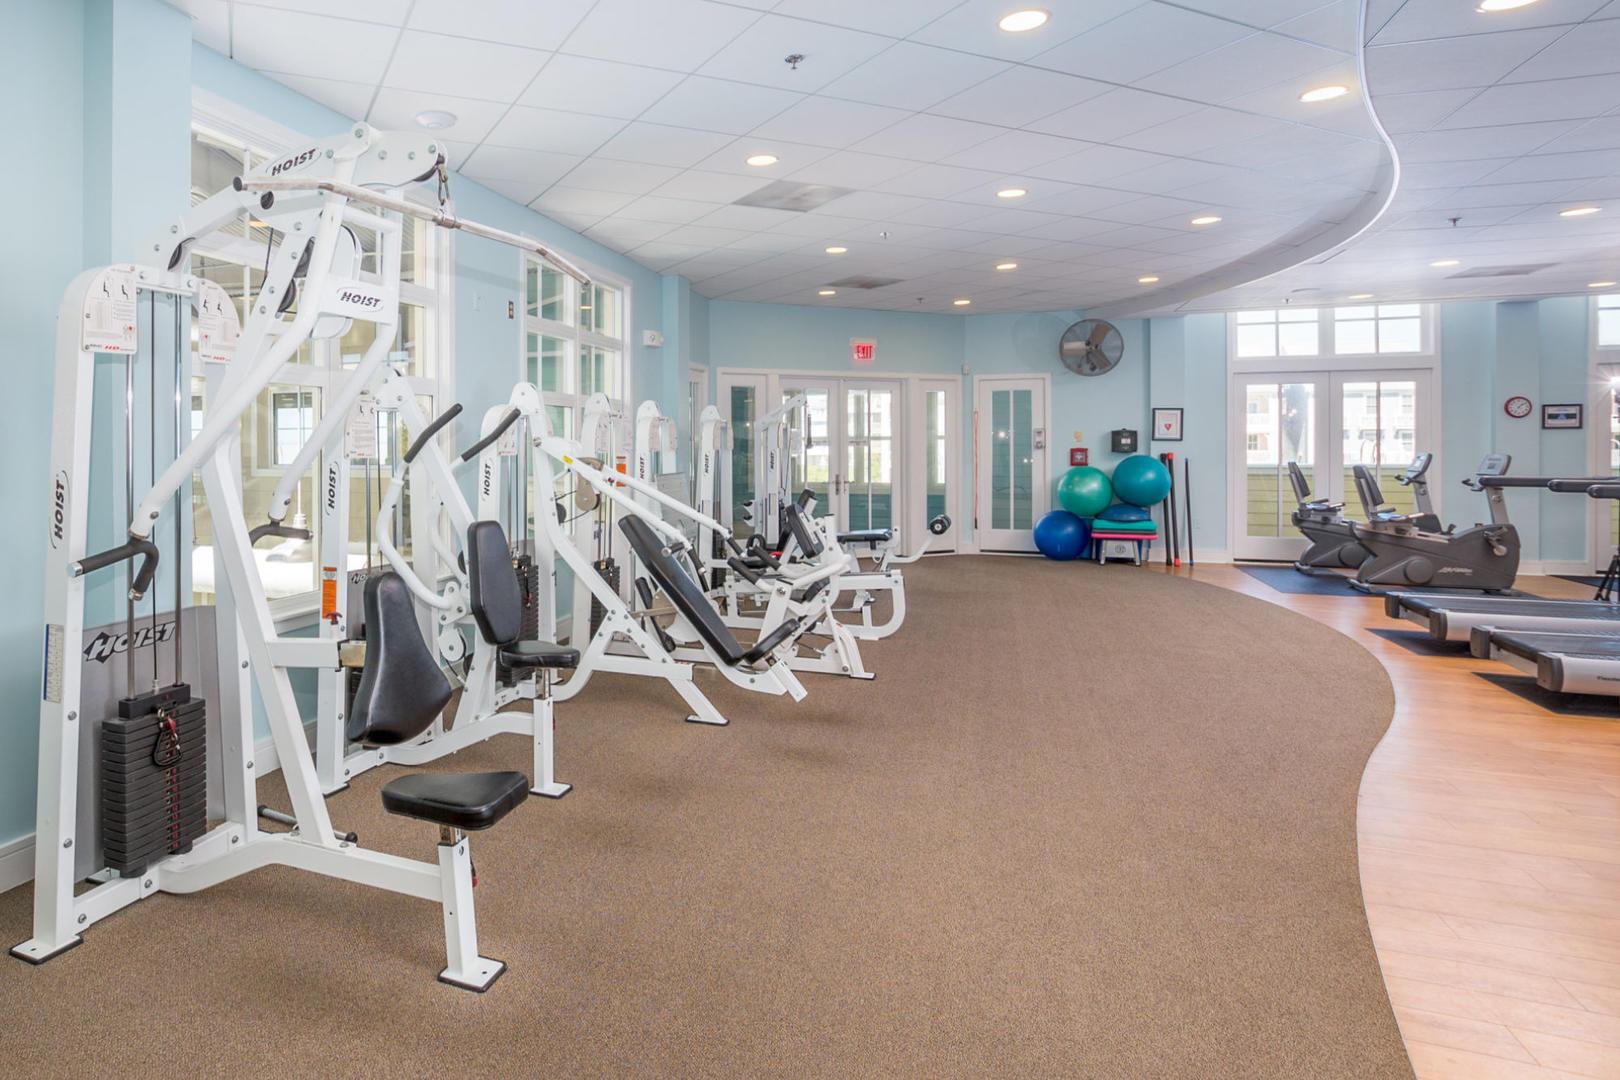 Sunset Island - Fitness Center